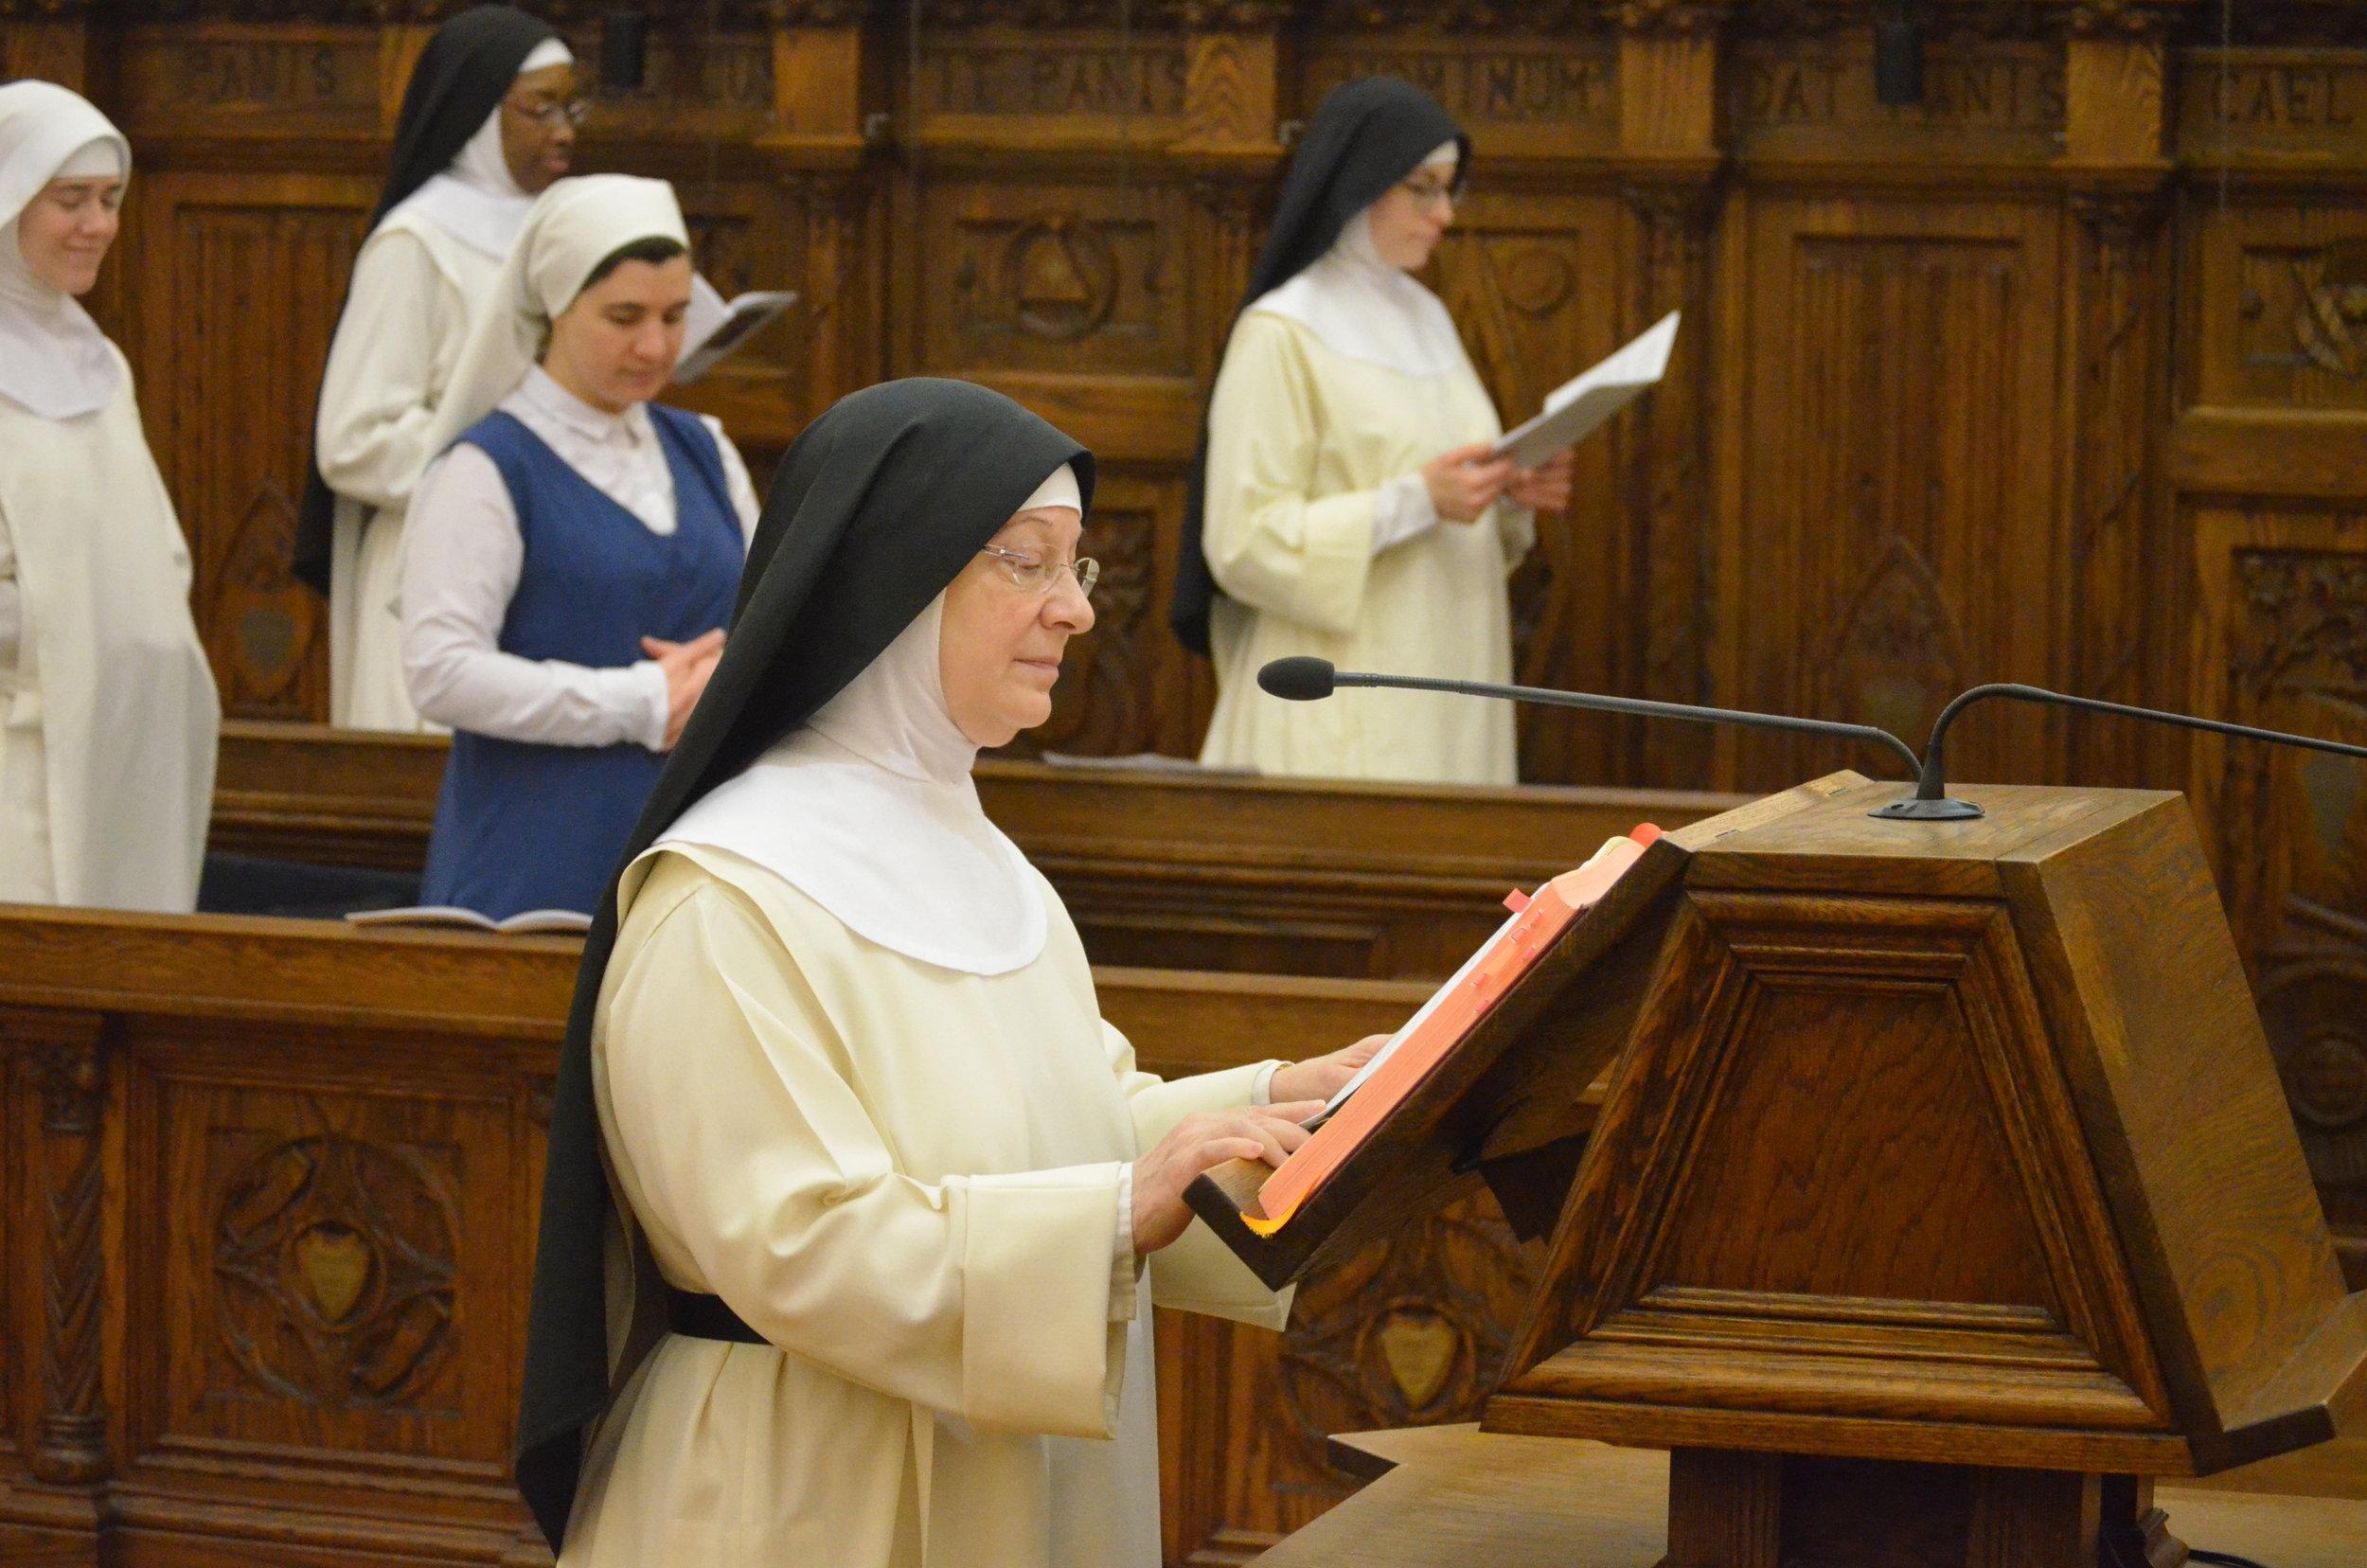 Sr. Denise Marie reads an intercession